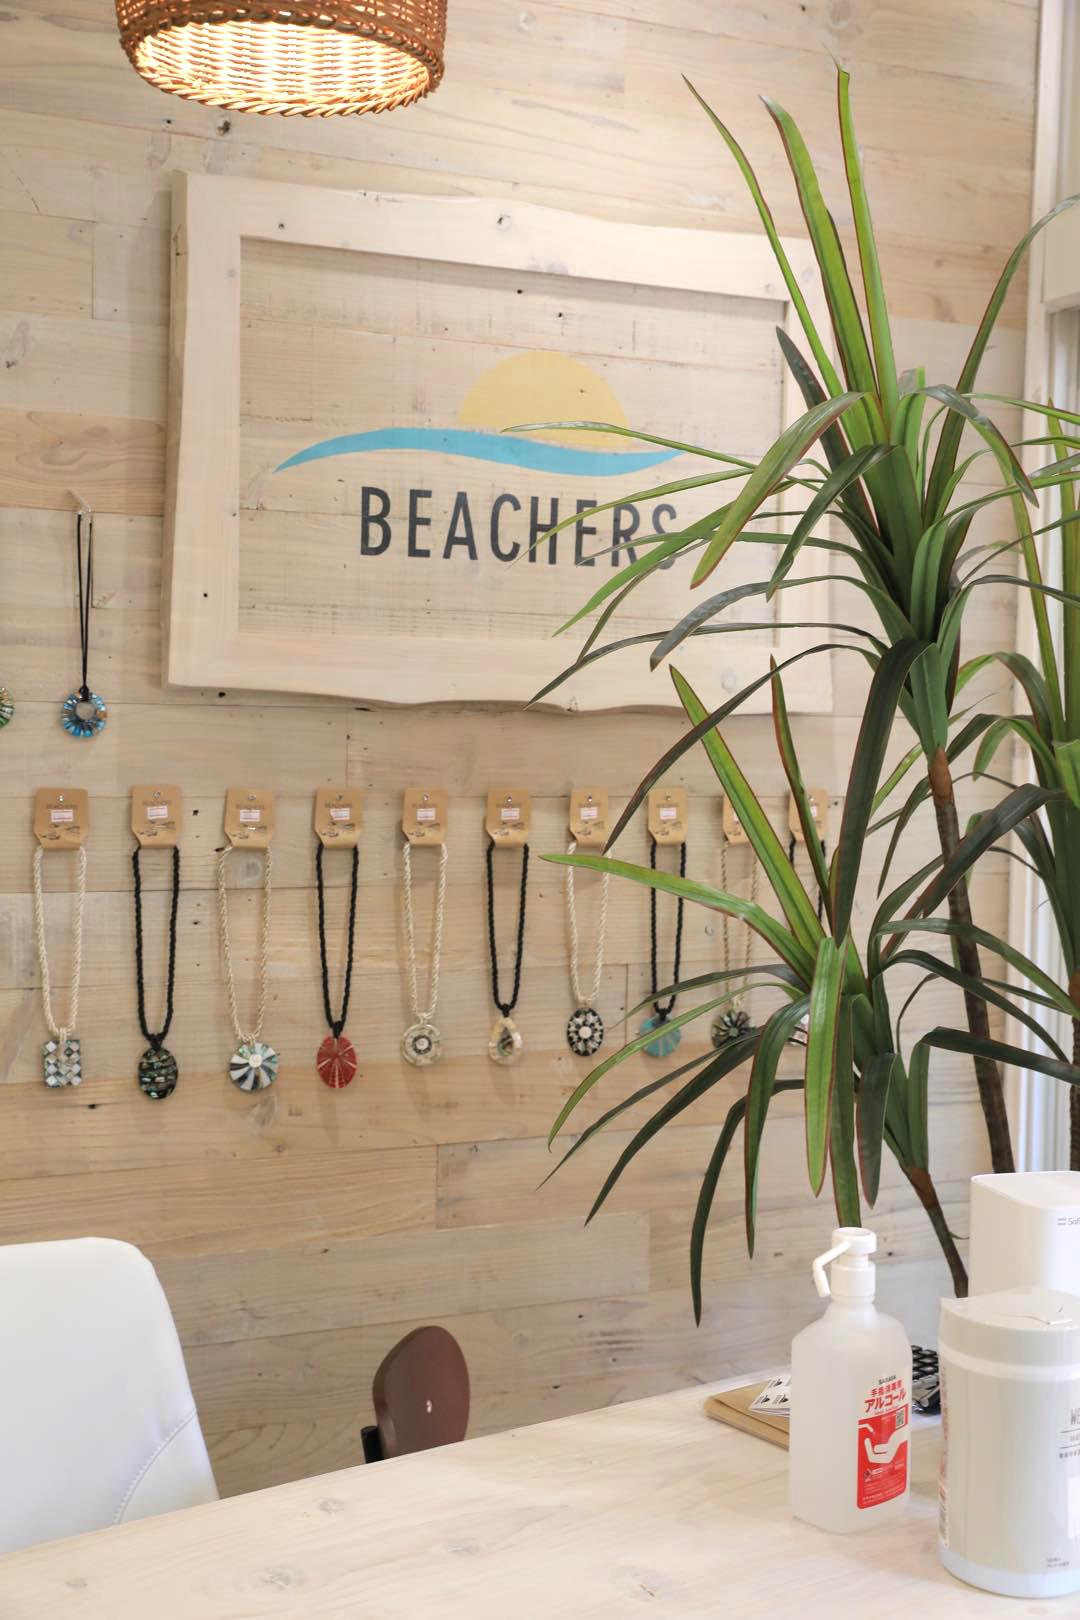 BEACHERS(ビーチャーズ)